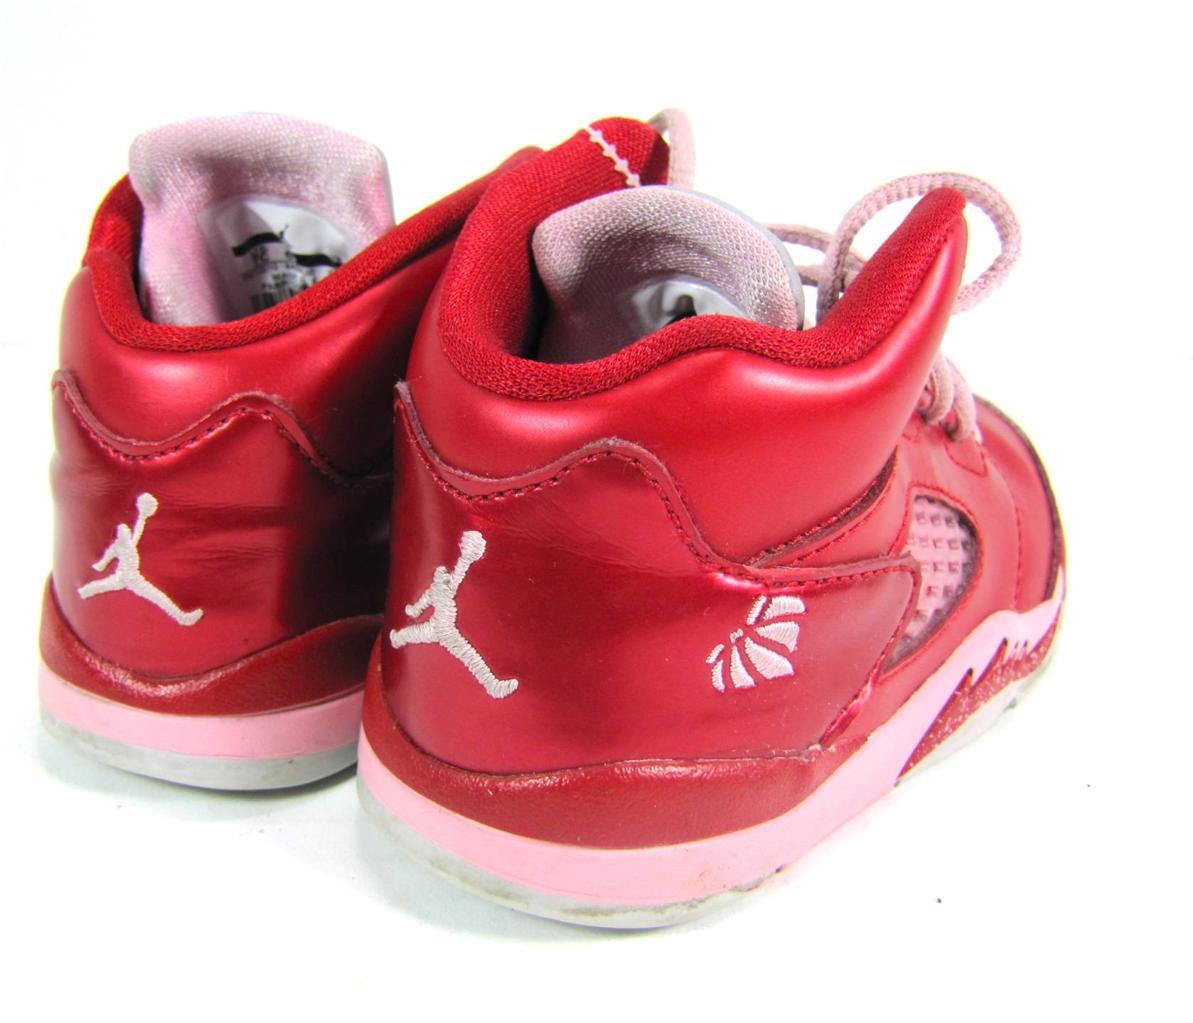 JORDAN Metallic Red and Pink Baby Girl Shoes Size 7C GOOD